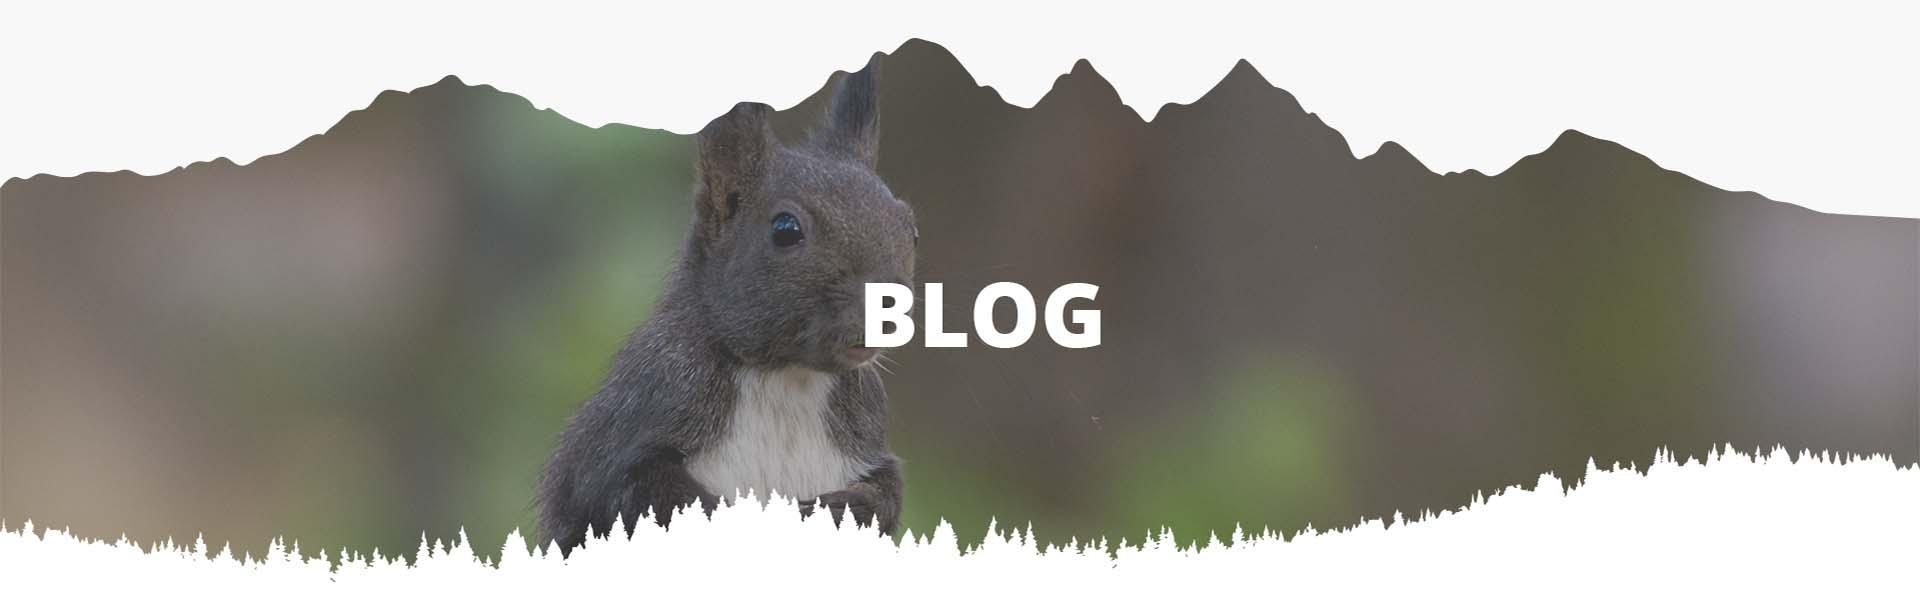 Blog - Tara Dornelor